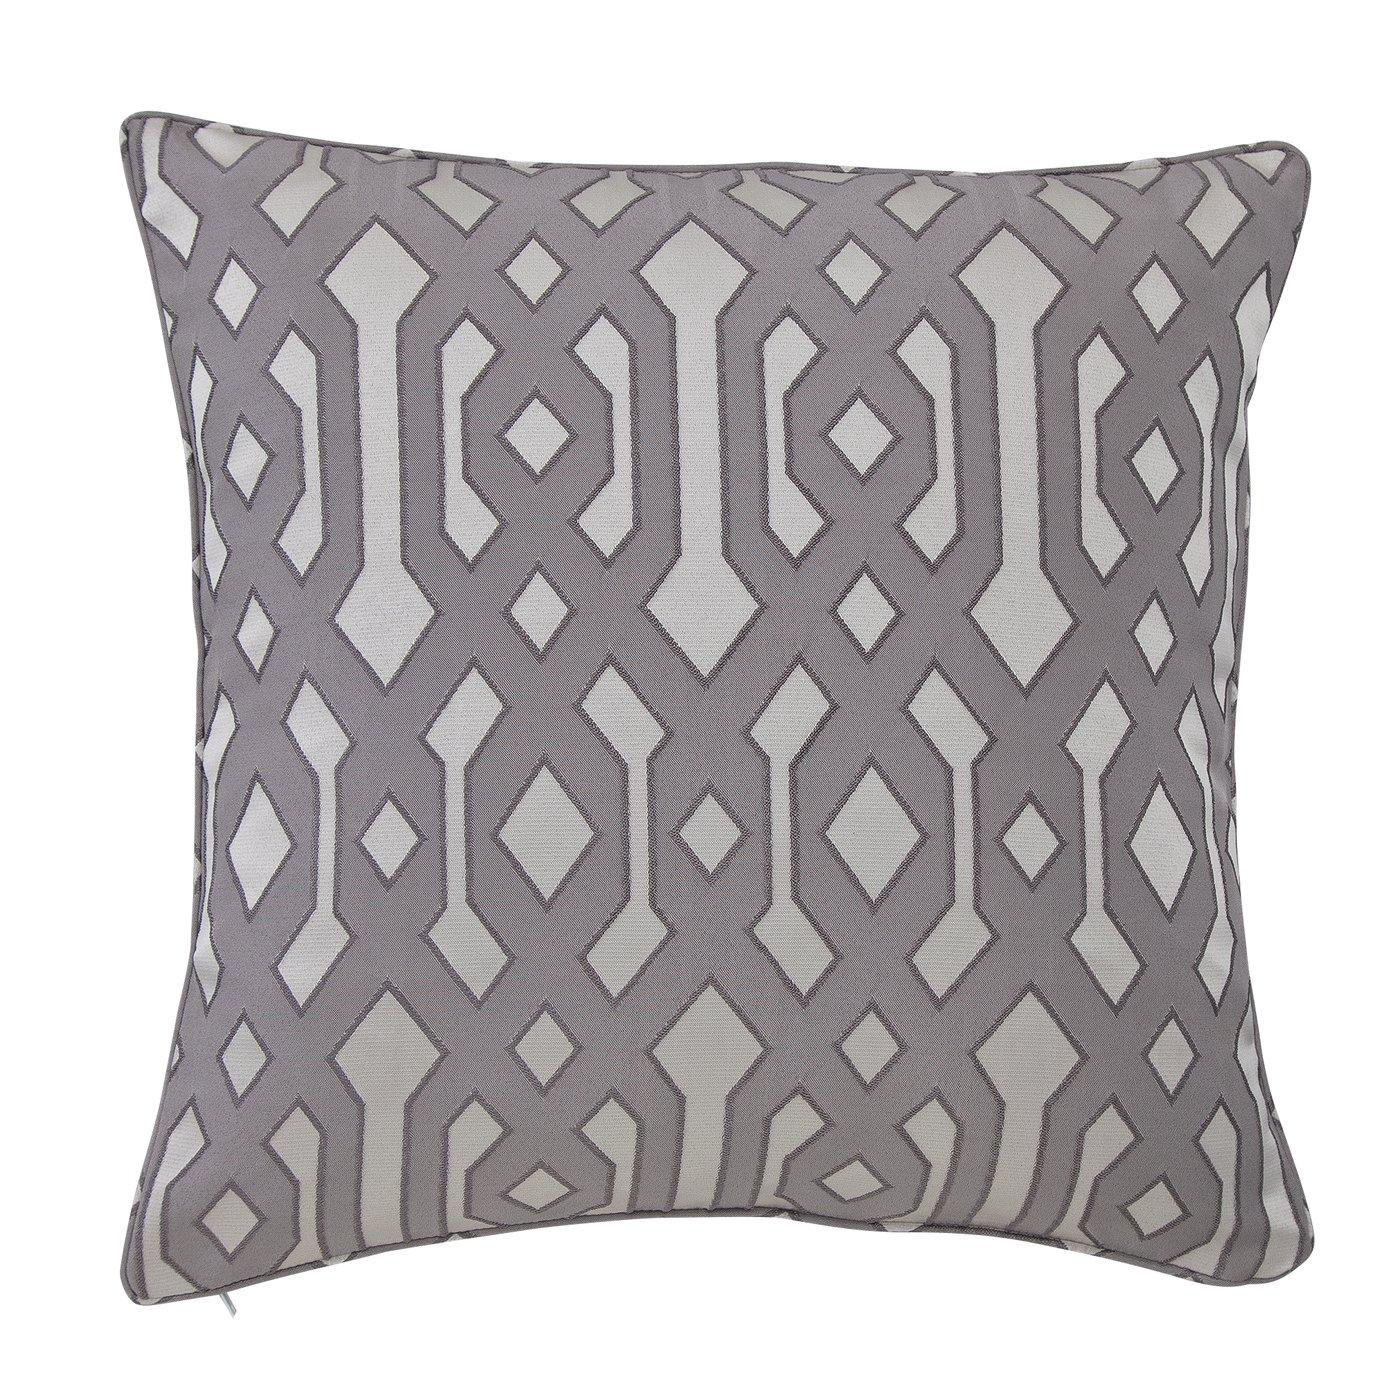 Argos Home Geometric Jacquard Cushion - Flint Grey